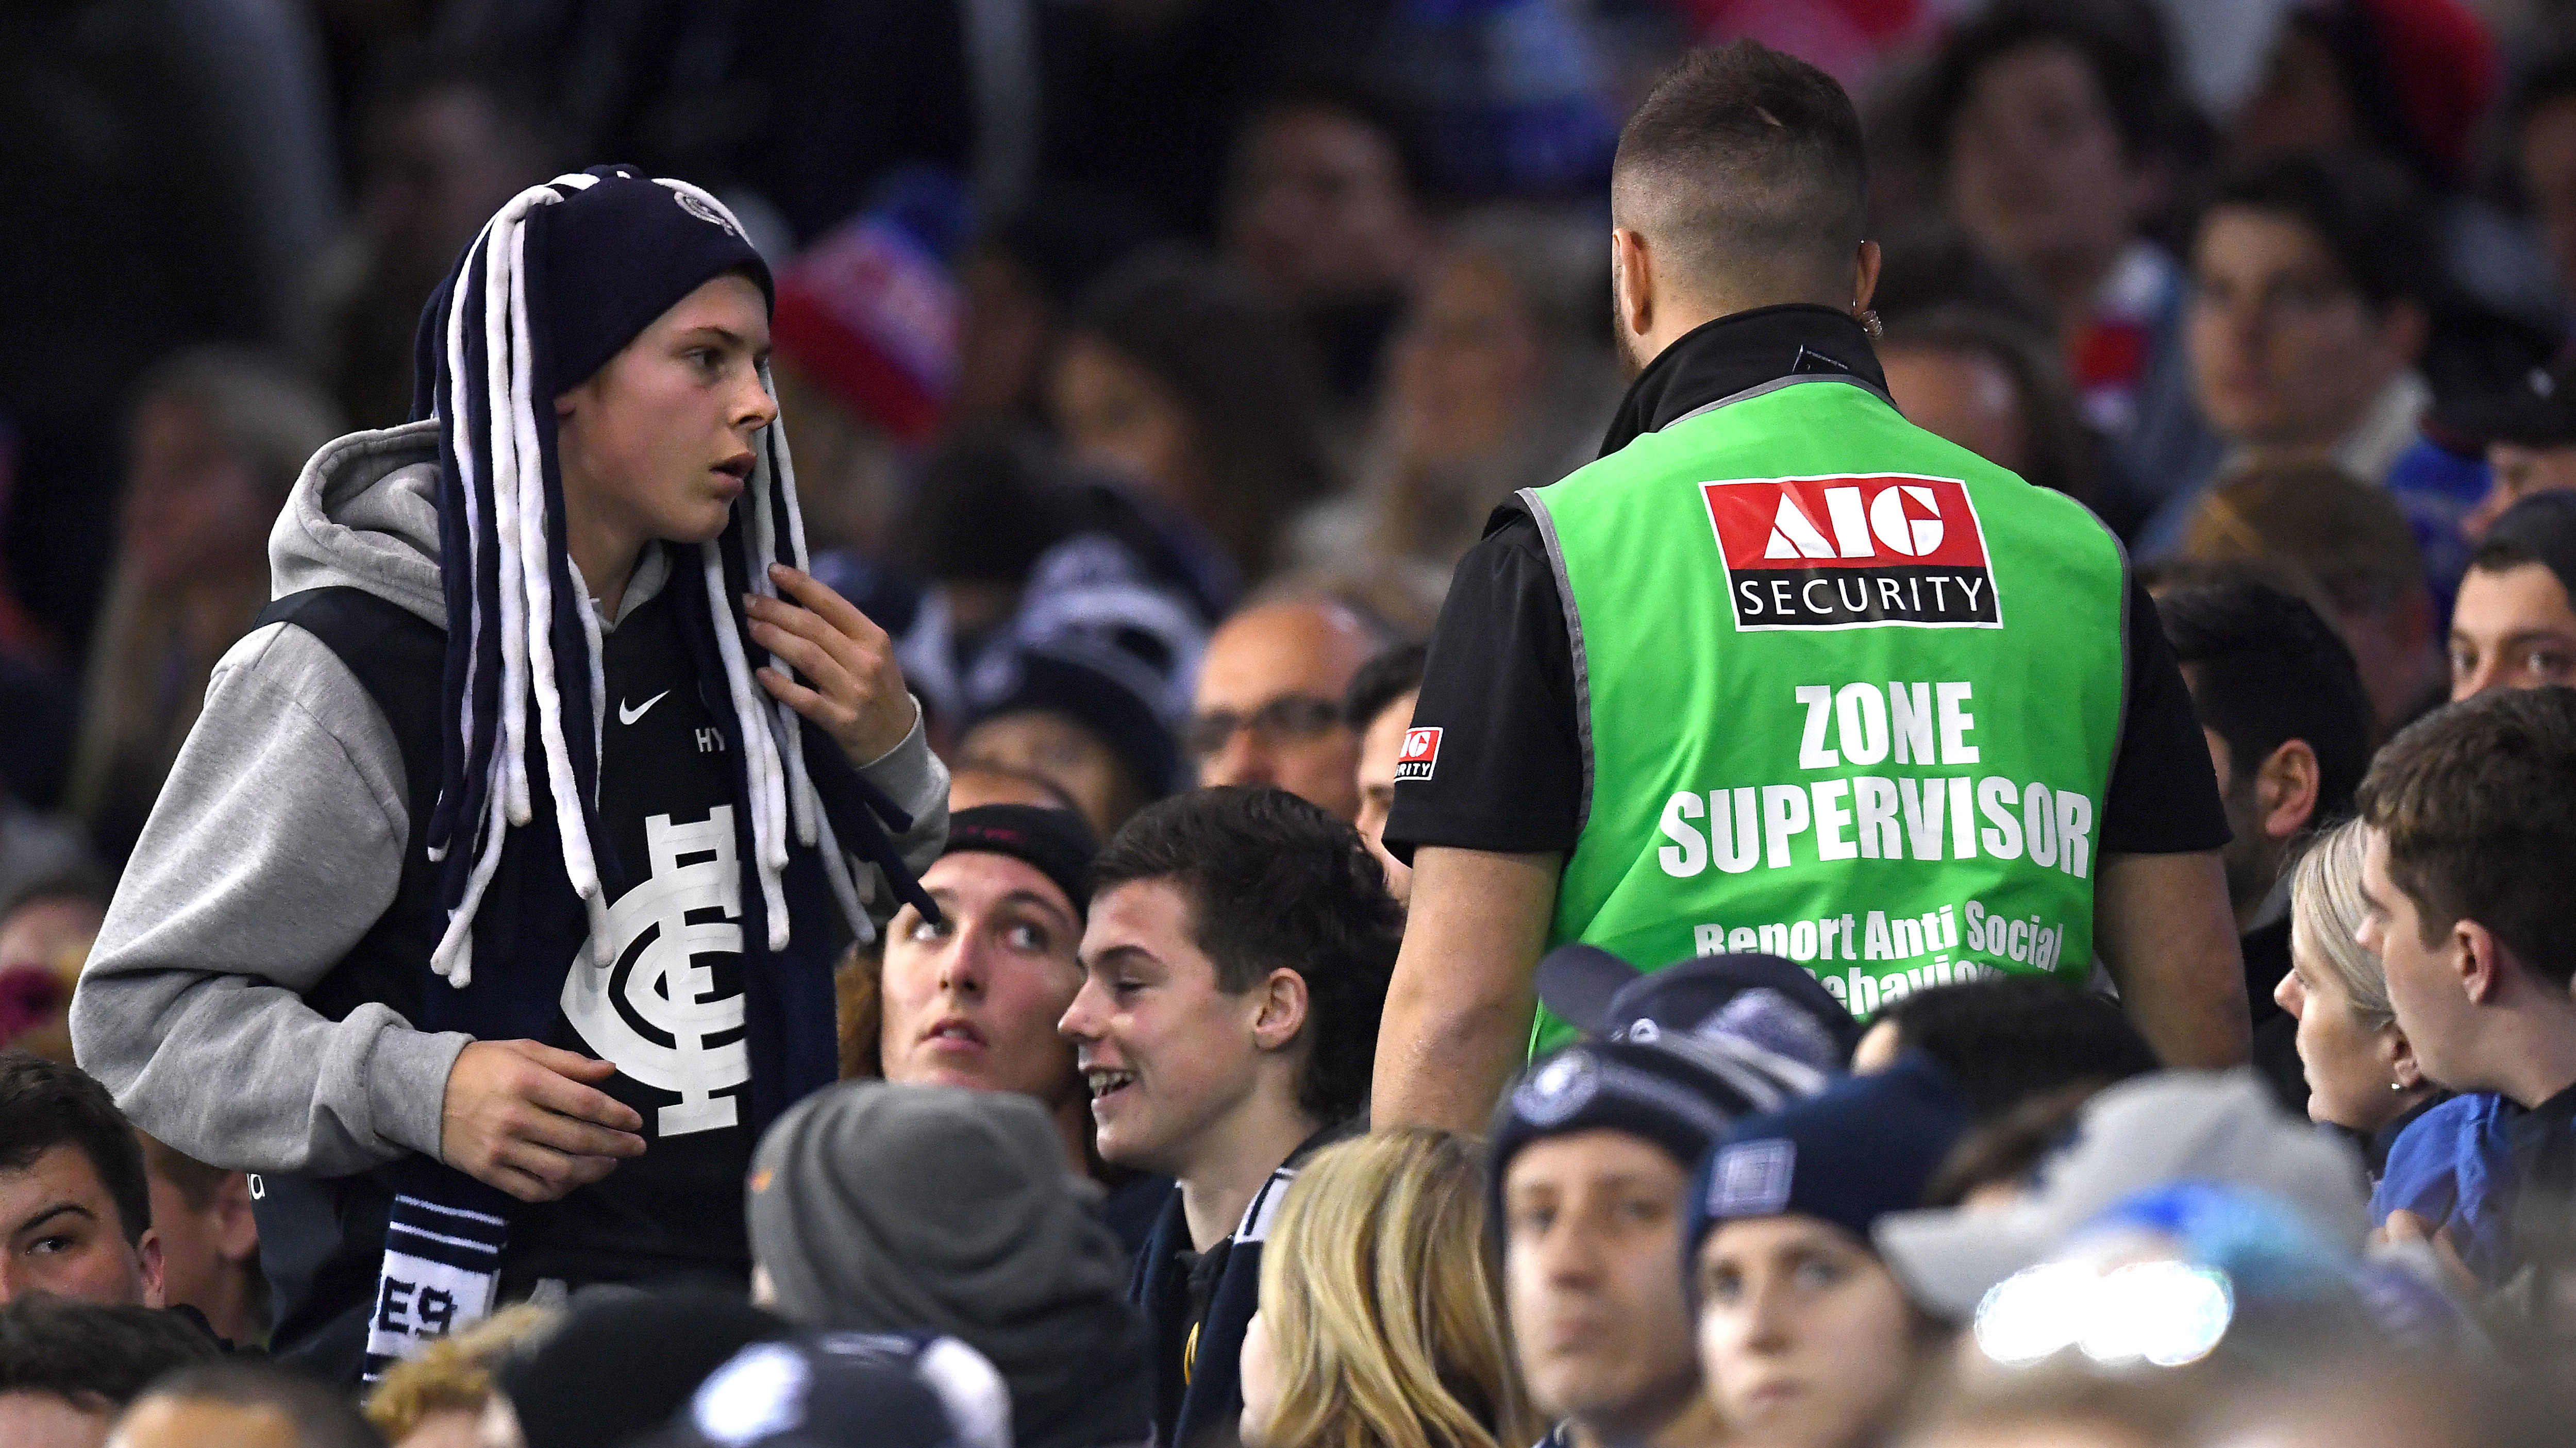 A crowd control officer patrols the stadium.